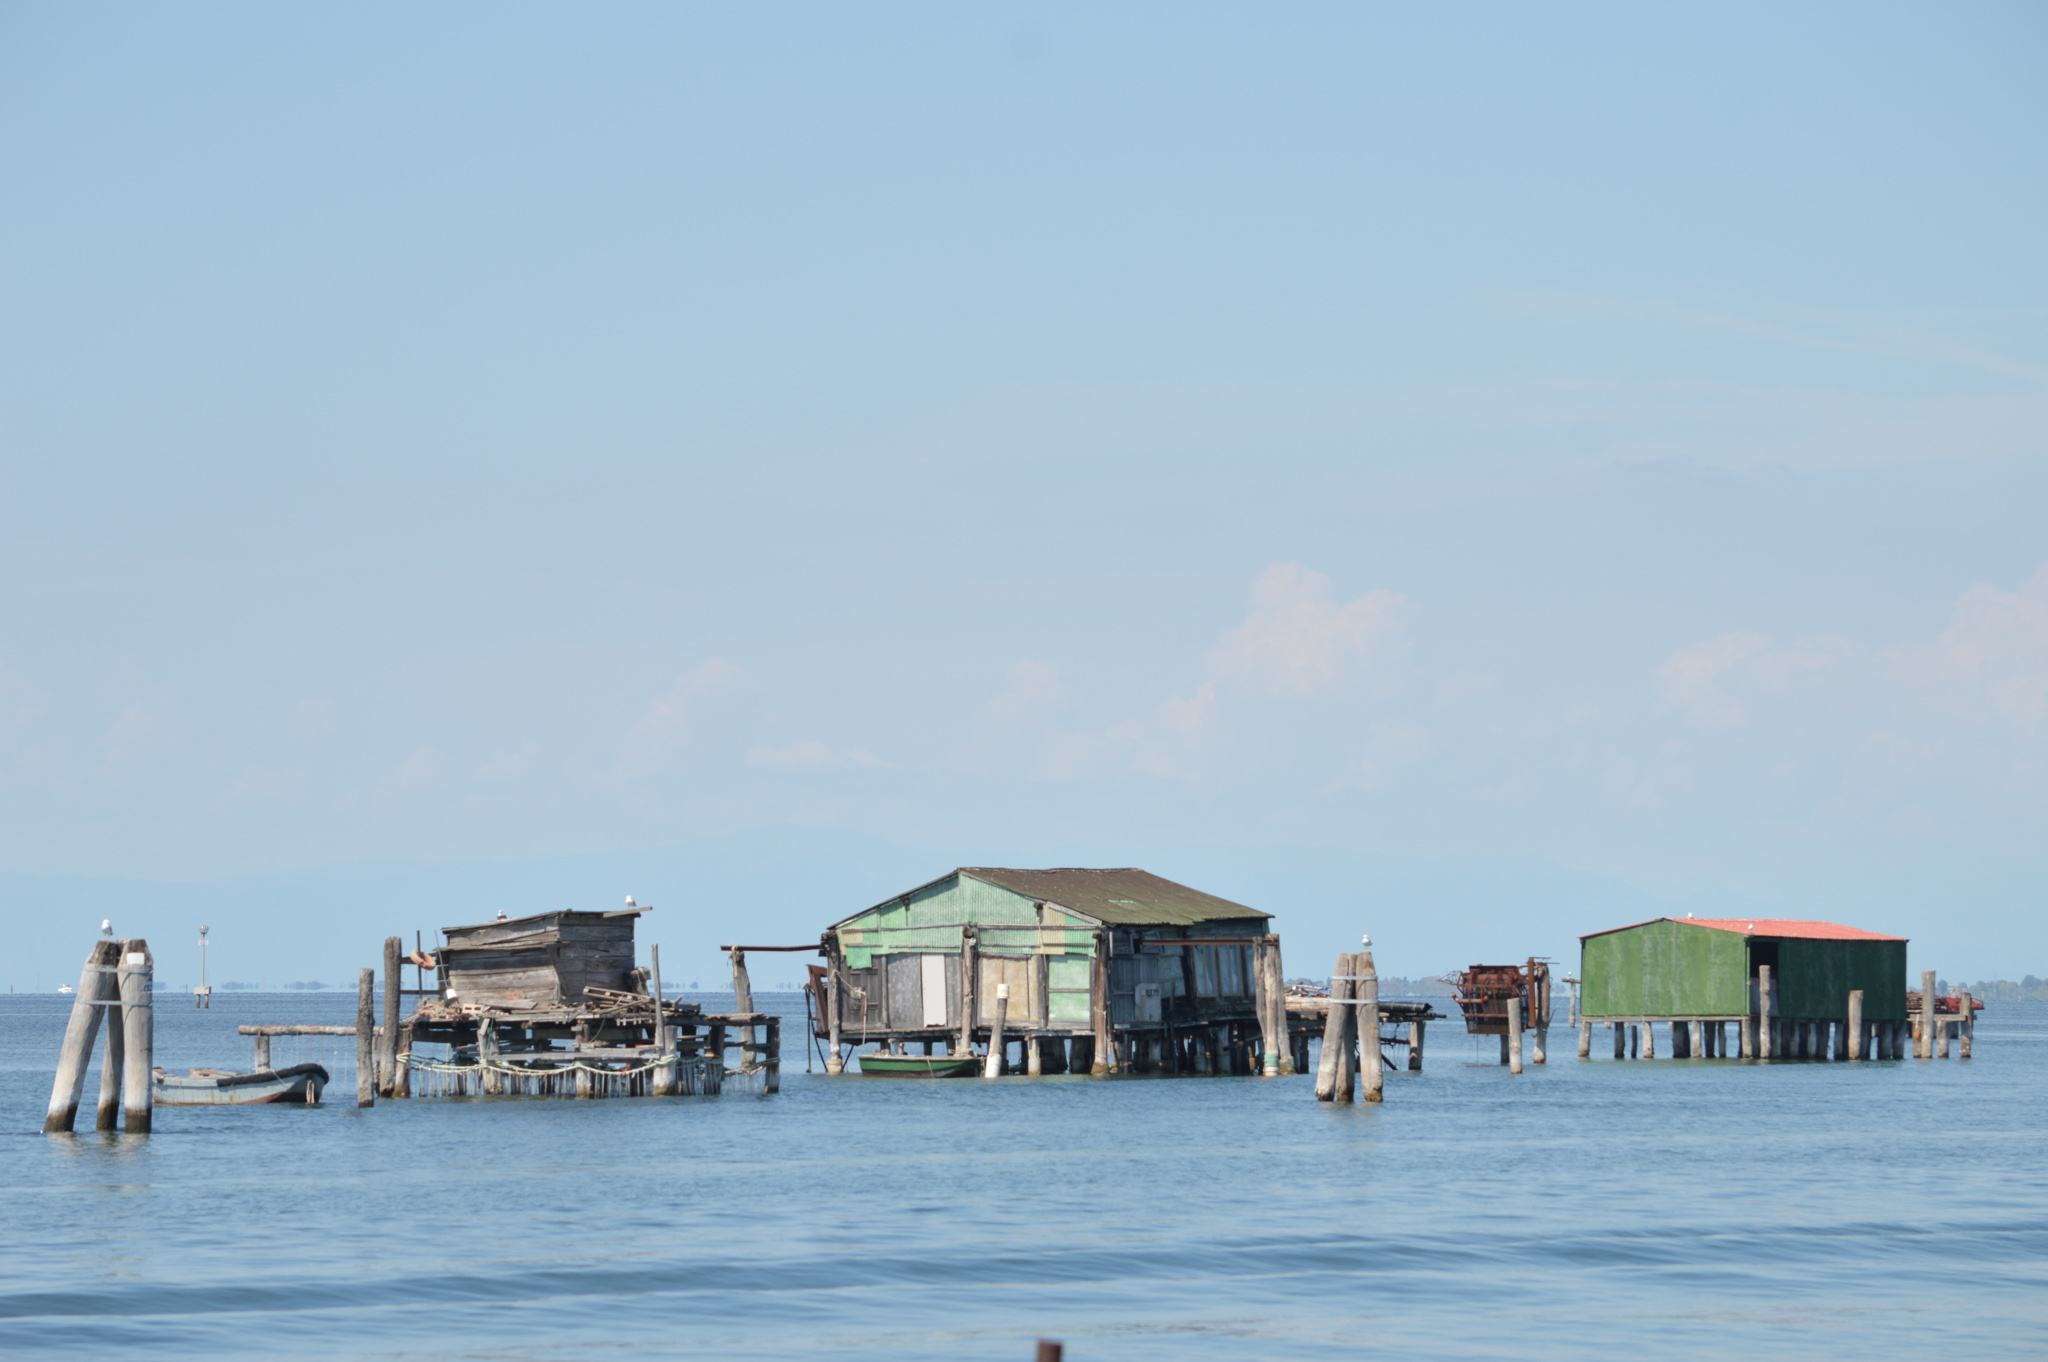 isola di pellestrina